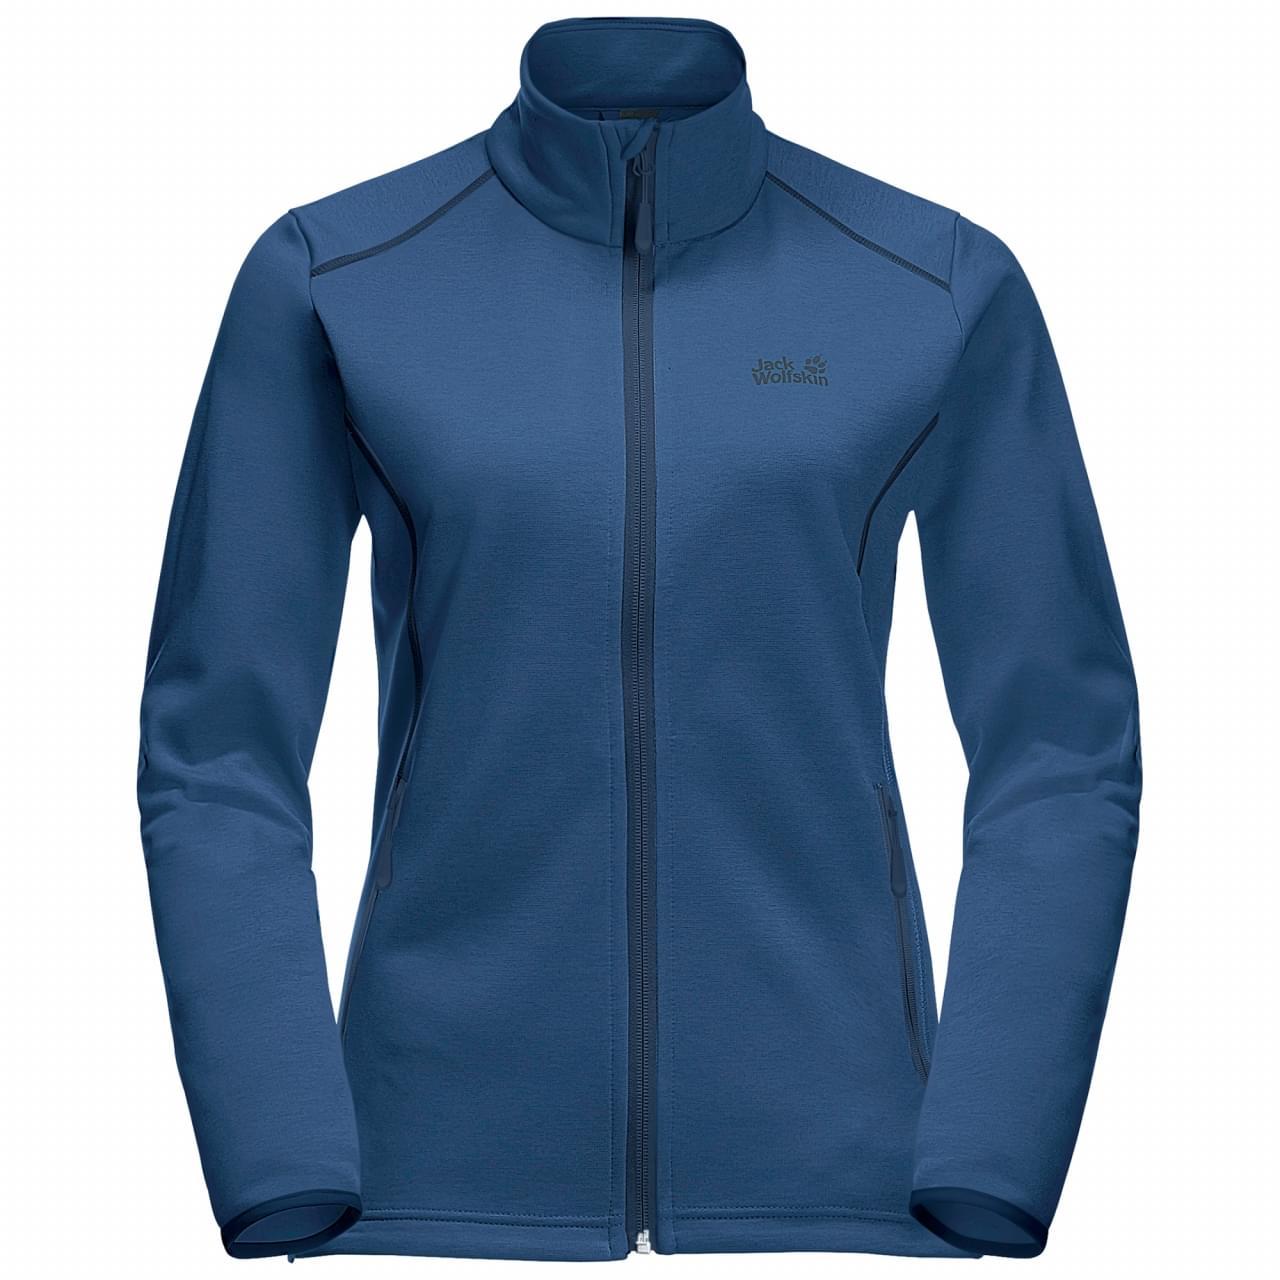 Jack Wolfskin Horizon Fleece Jacket Dames Blauw